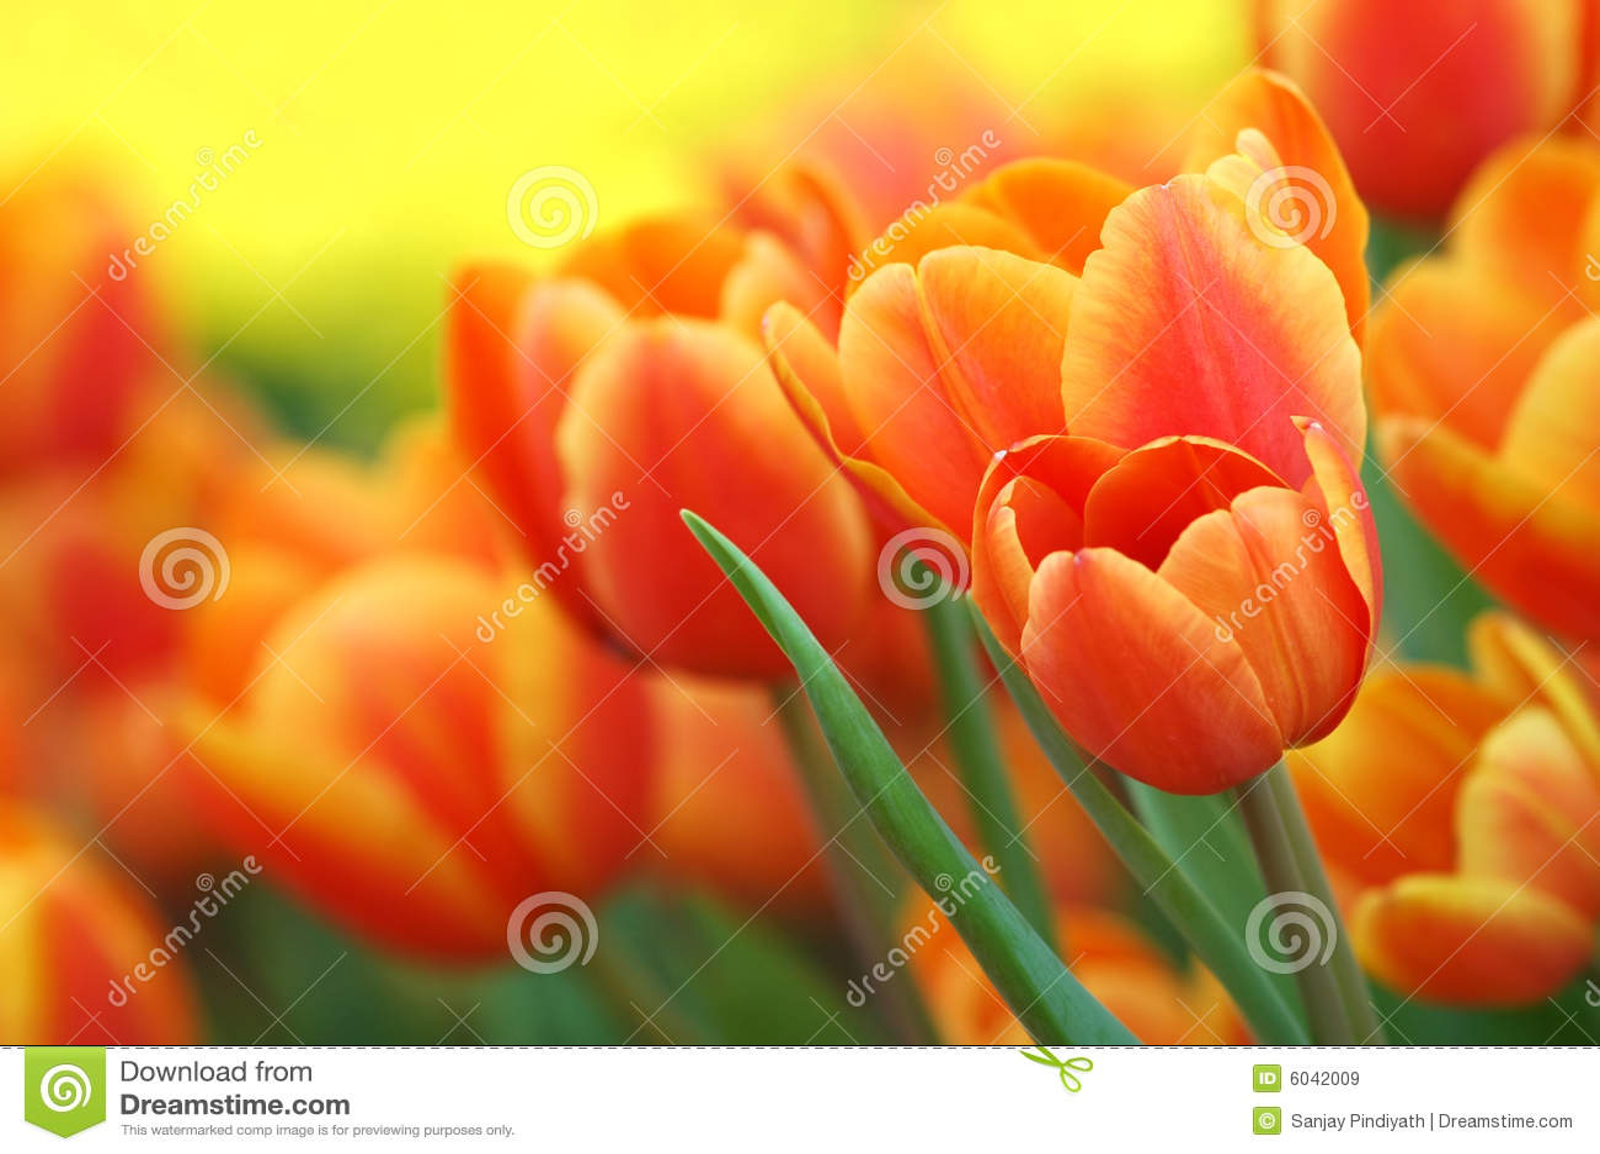 Tulipani arancioni nel giardino